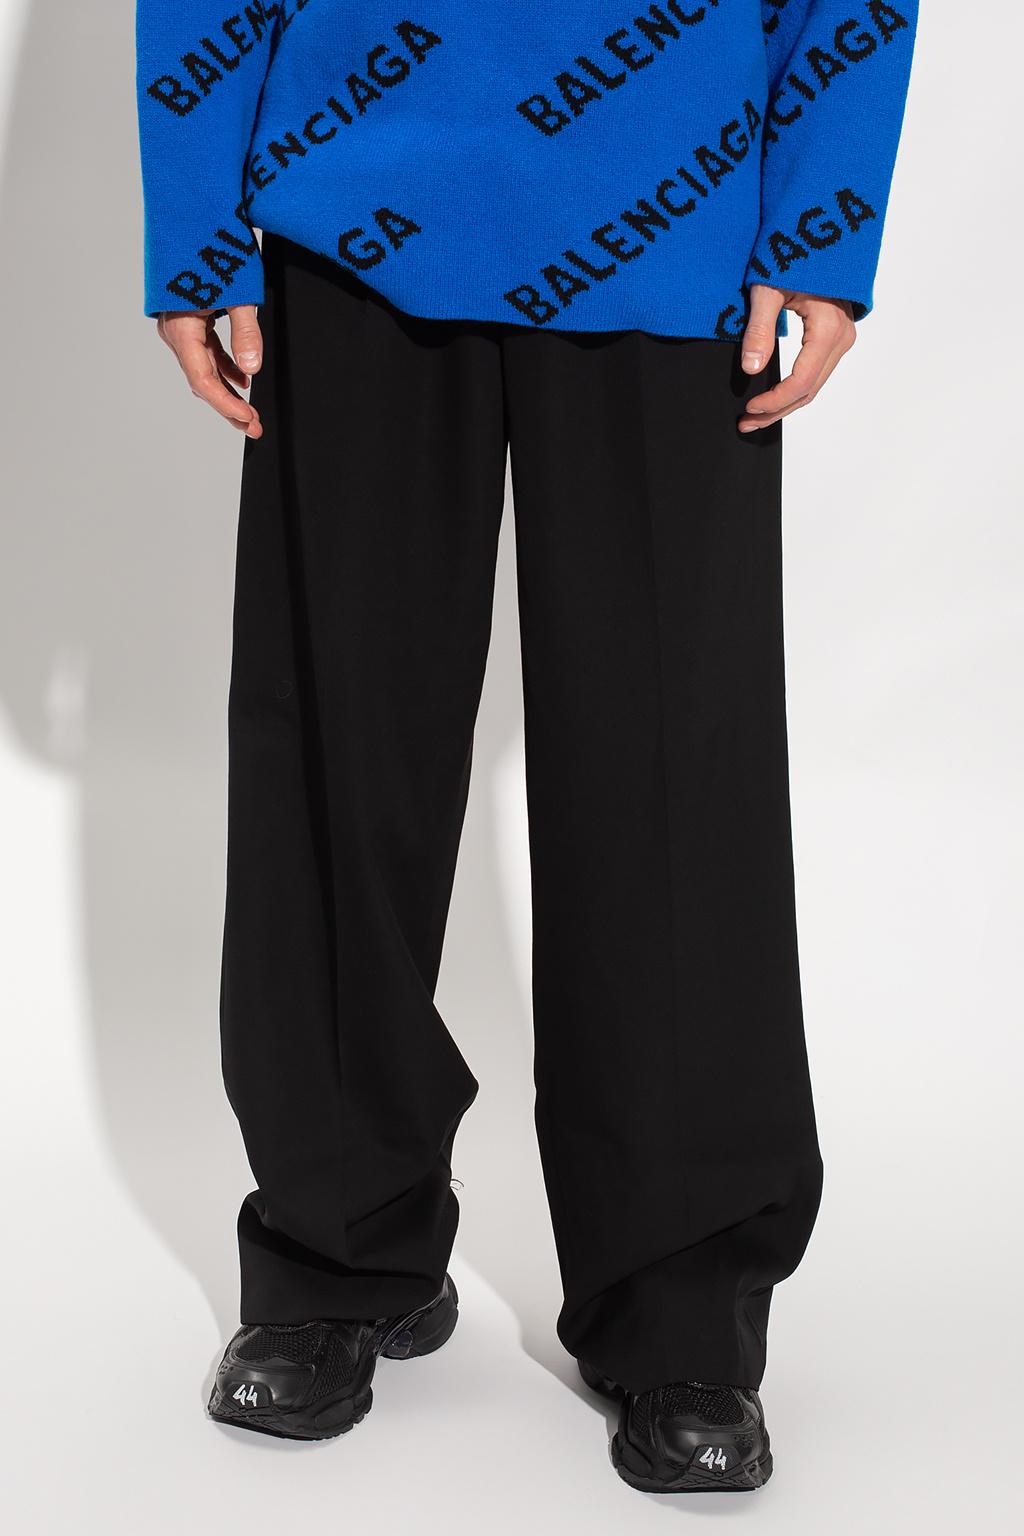 Balenciaga Pleat-front trousers